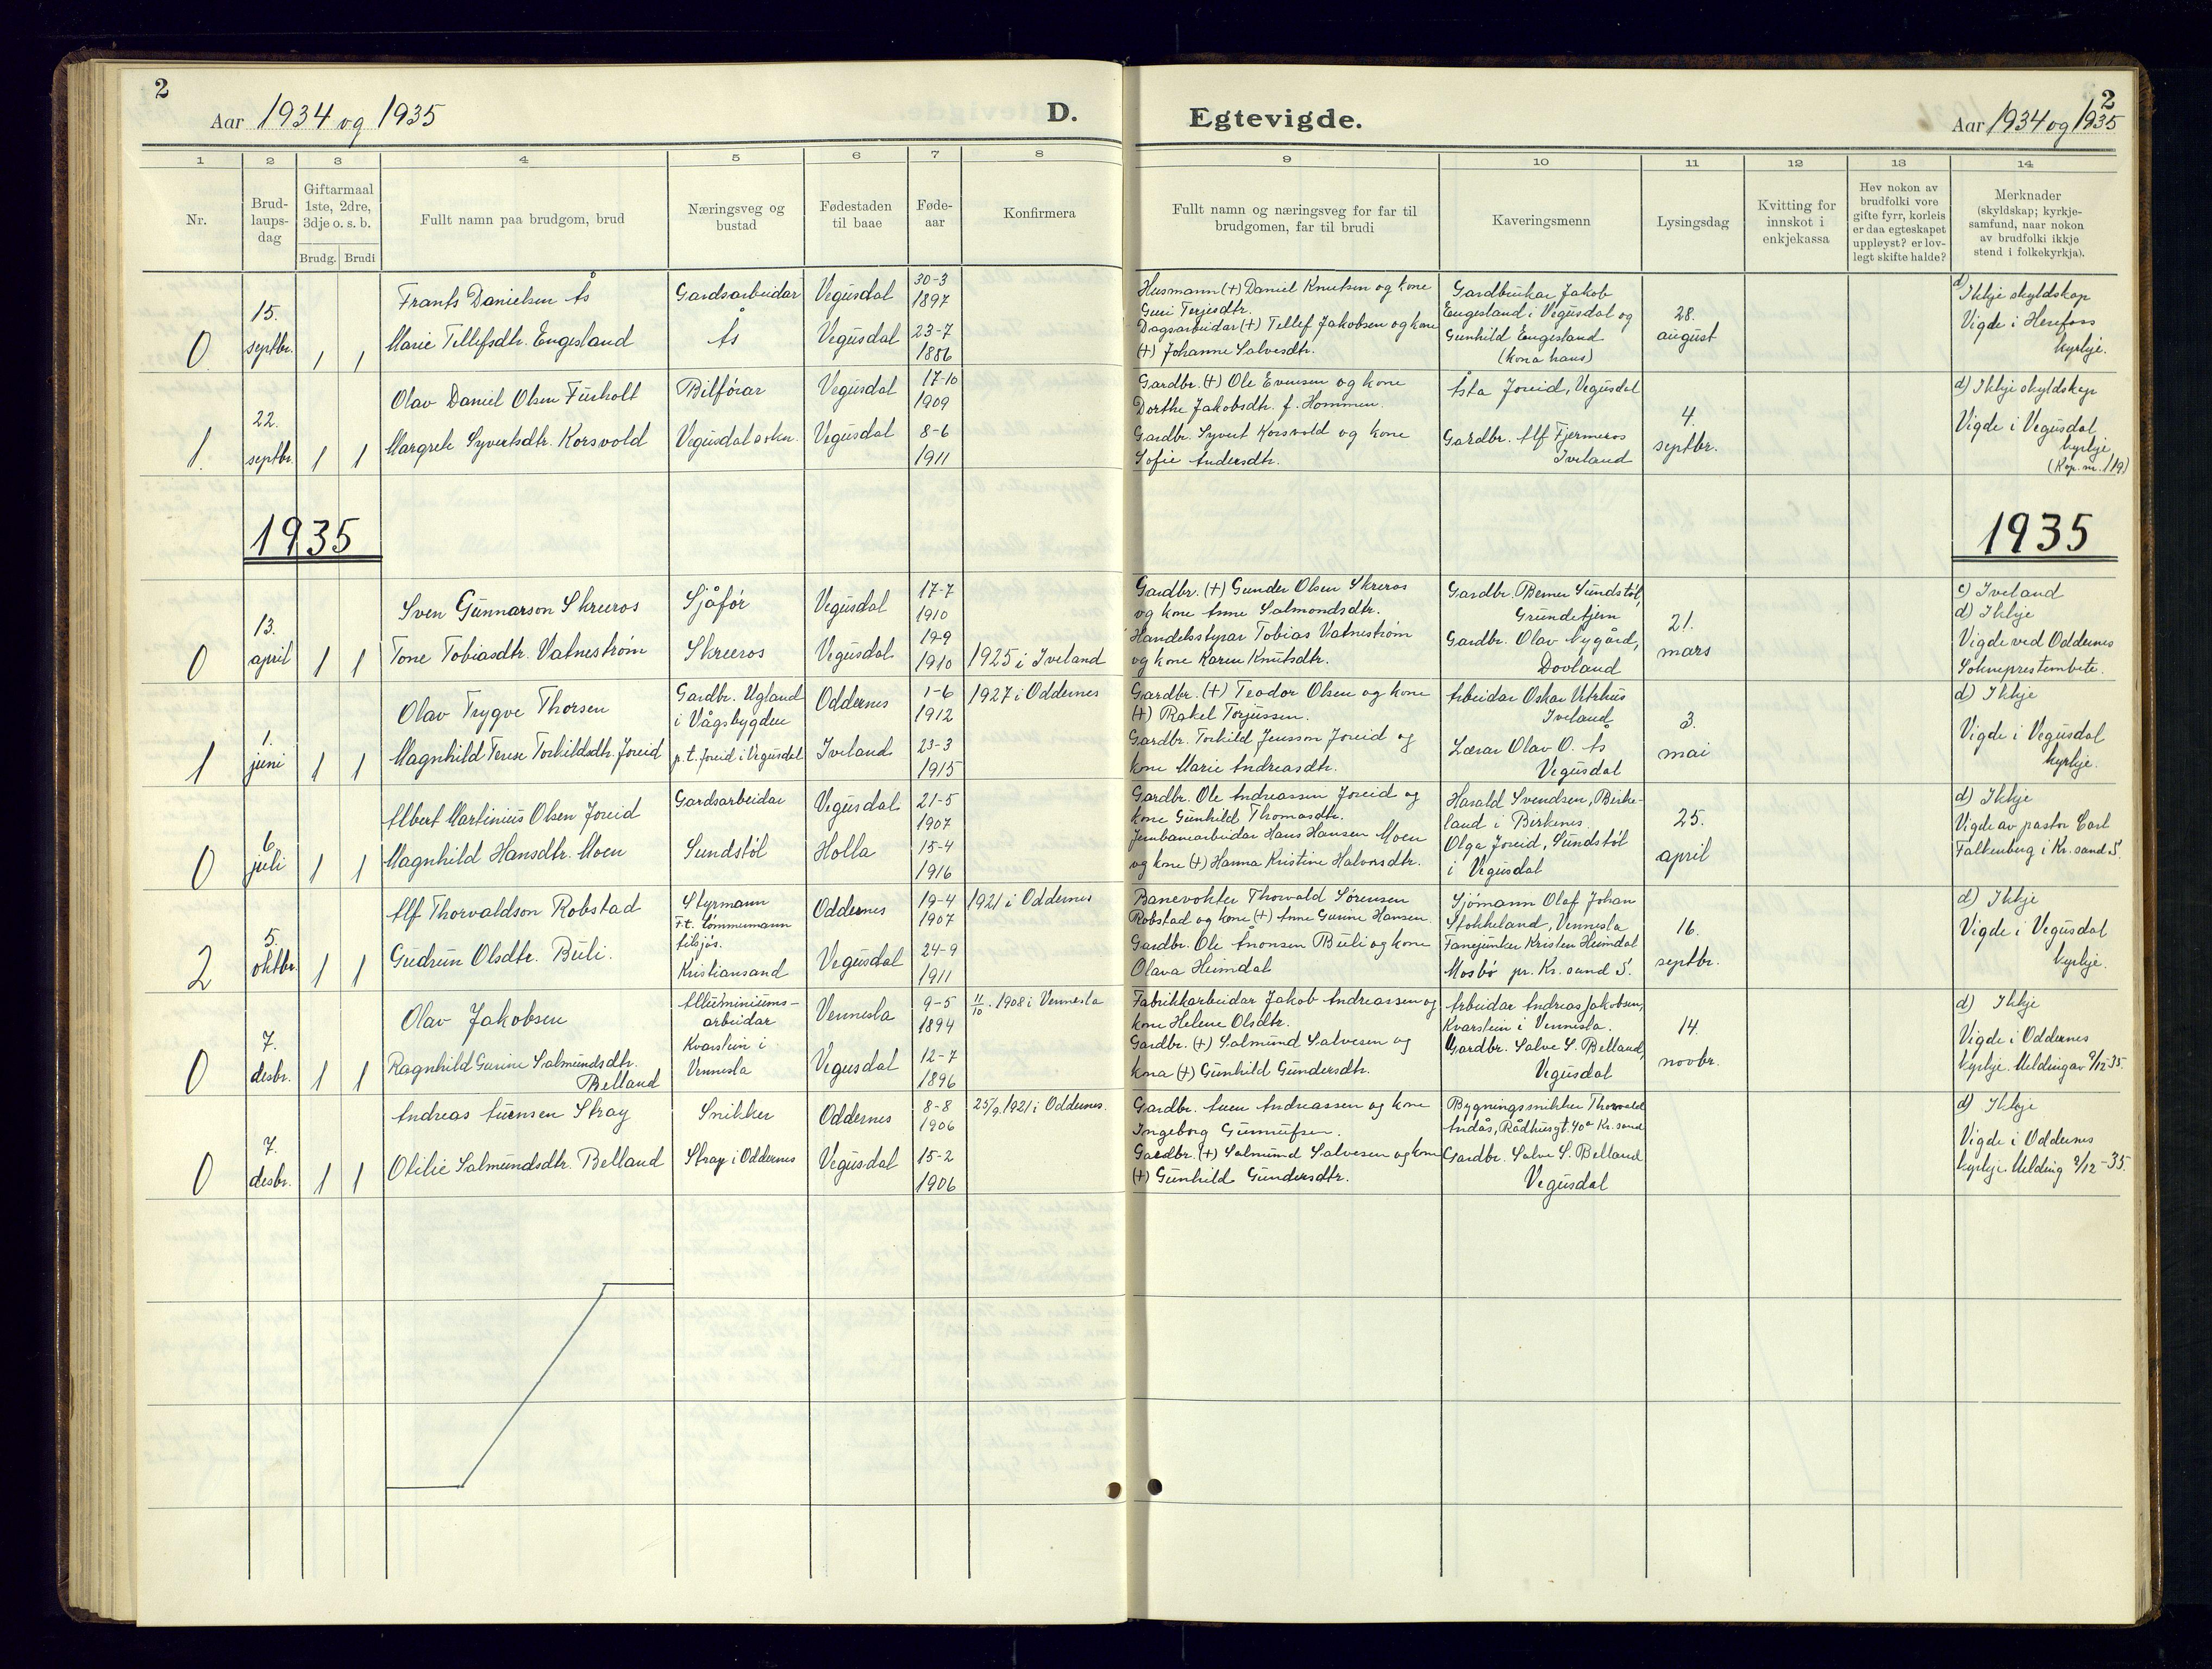 SAK, Herefoss sokneprestkontor, F/Fb/Fbb/L0005: Klokkerbok nr. B-5, 1933-1961, s. 2